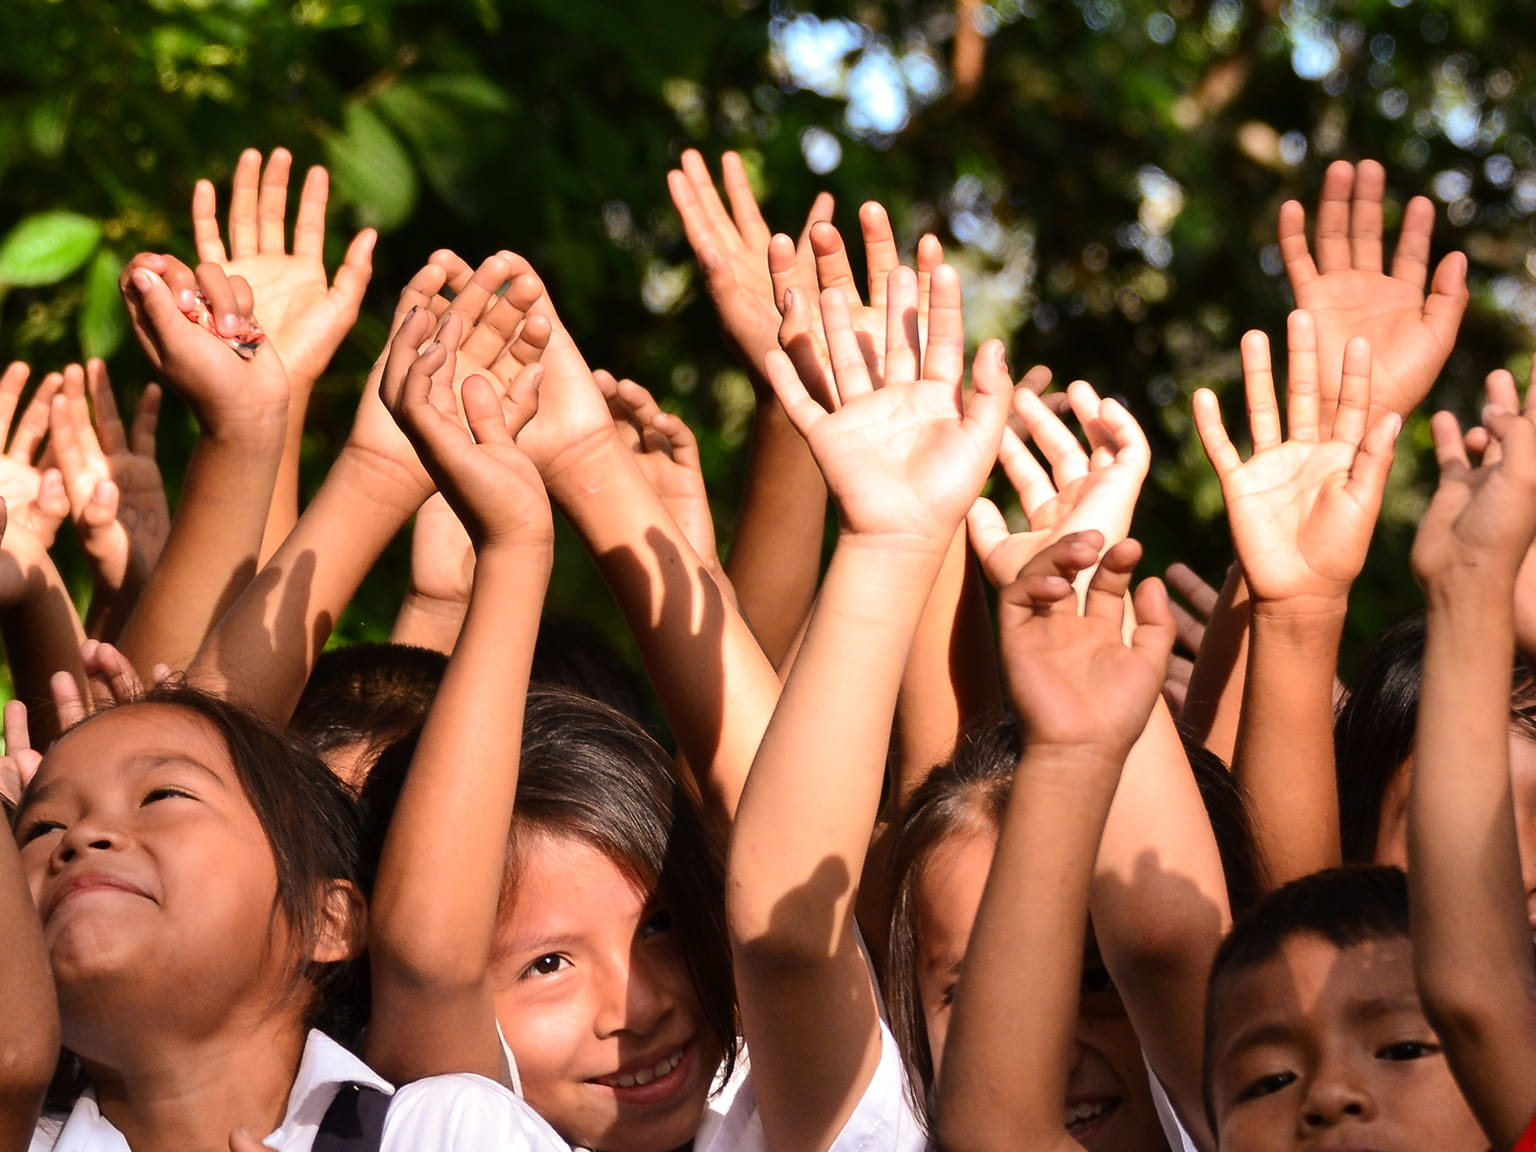 Brother Earth copii cu mâinile ridicate